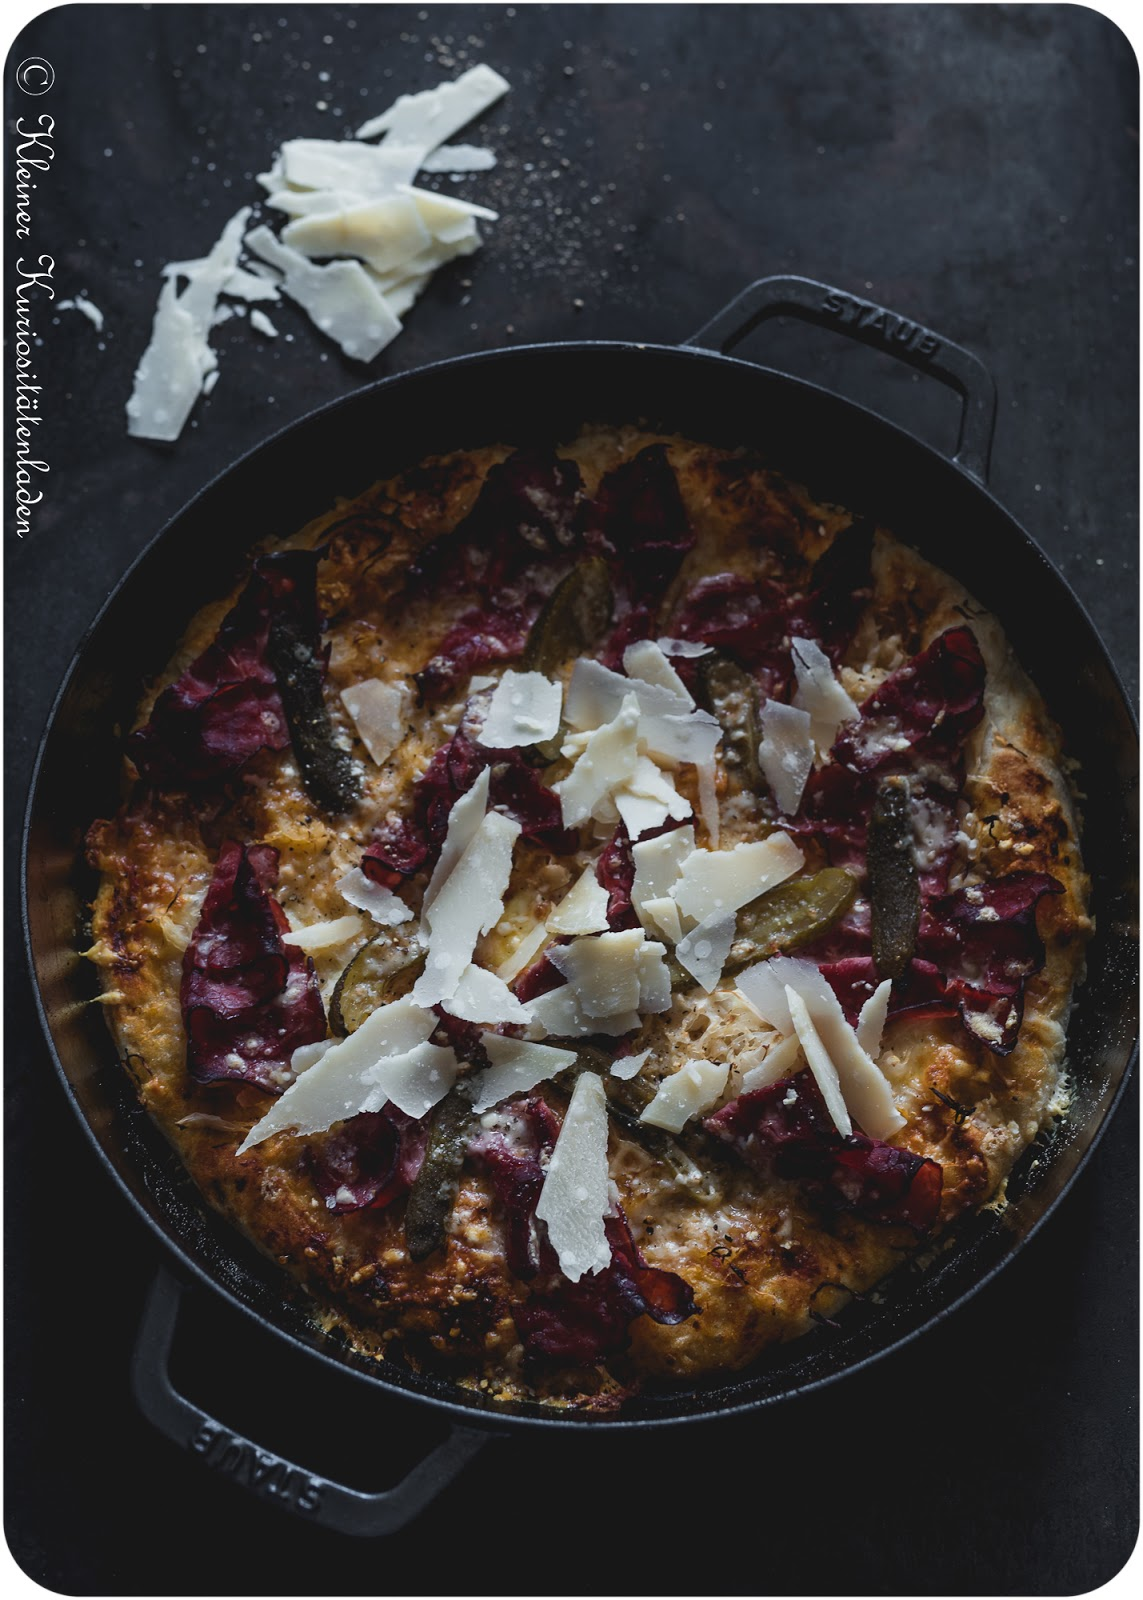 Cast-Iron Pan Pizza